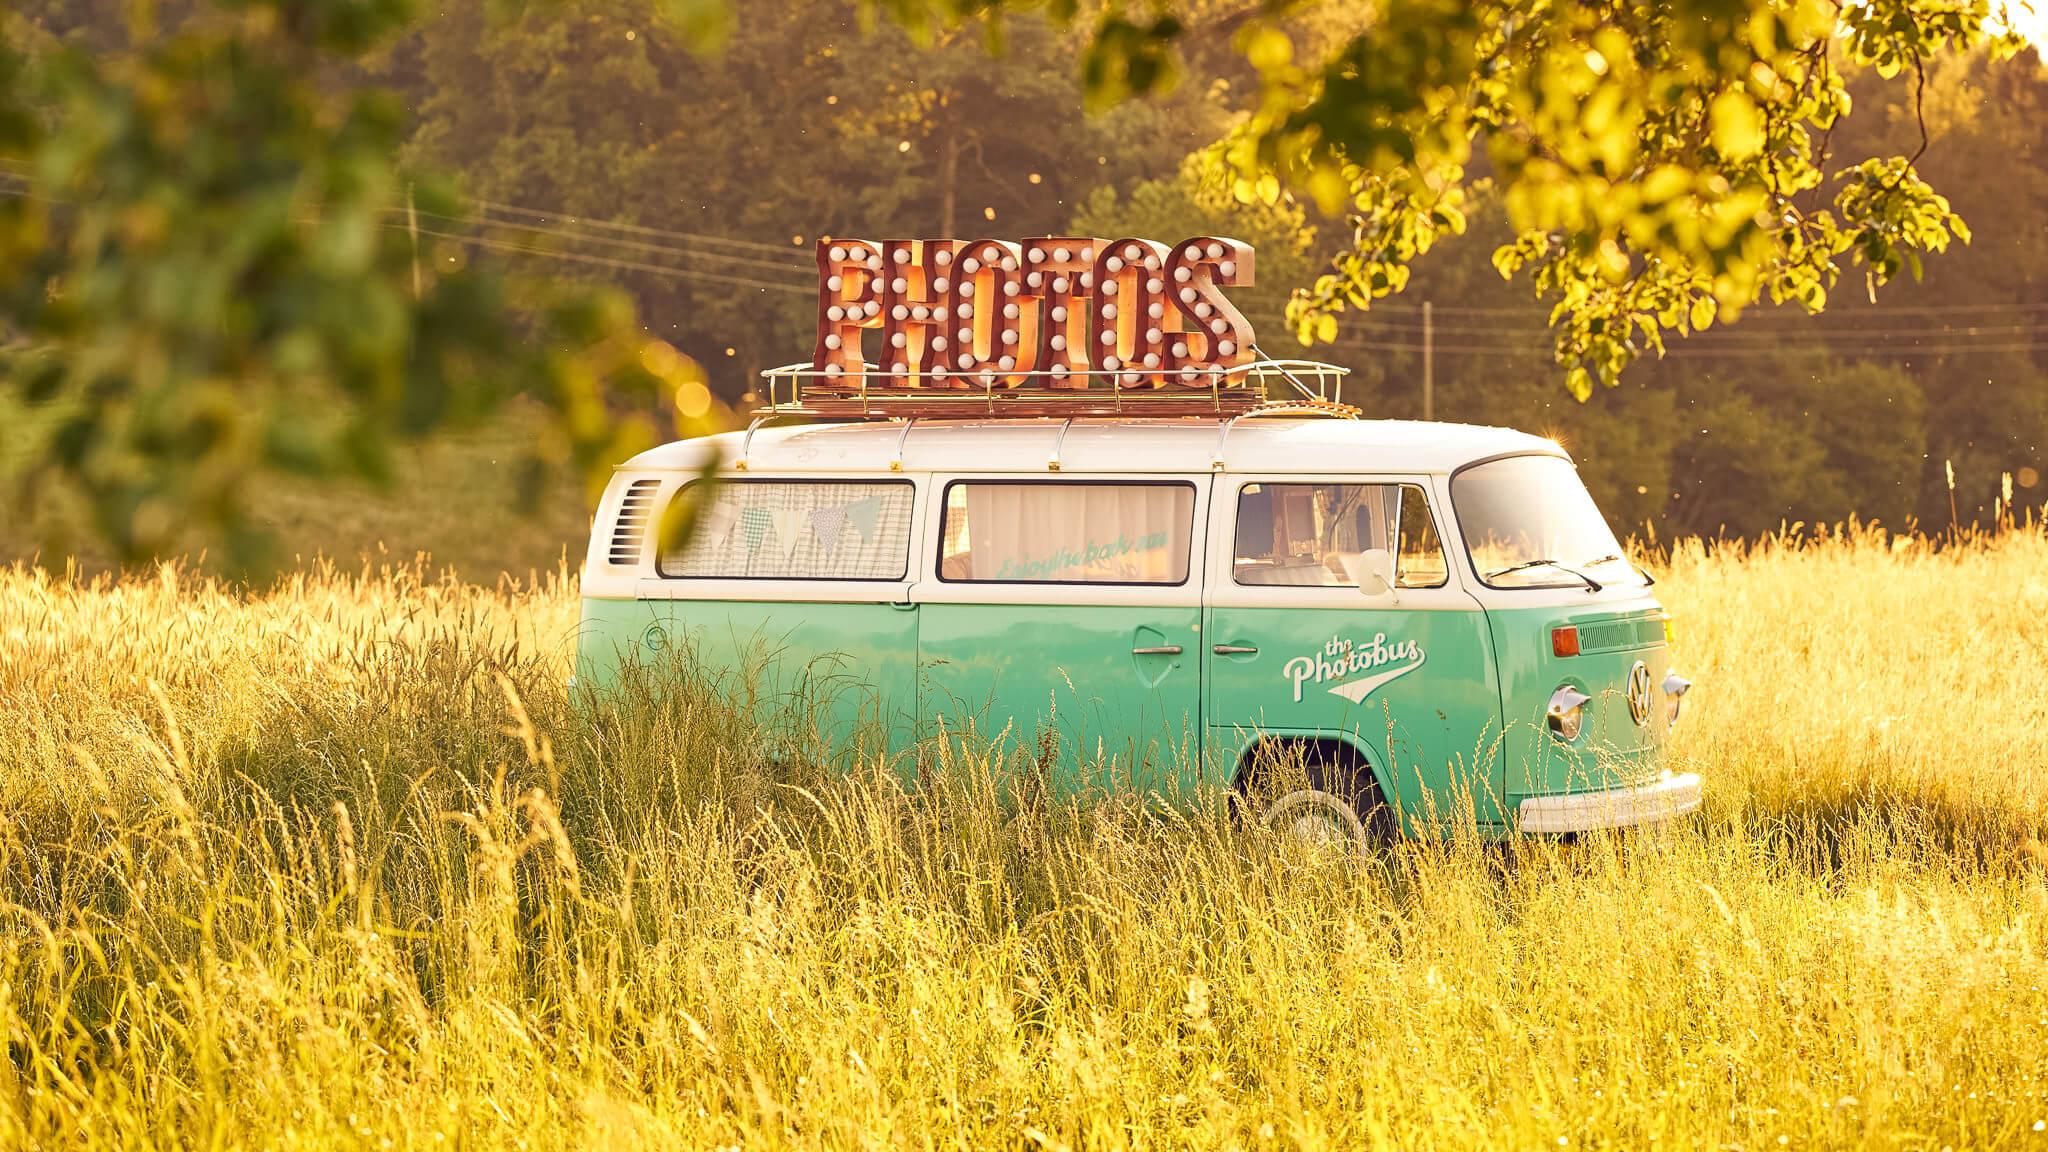 Photobus - Der Fotobus mit Photobooth